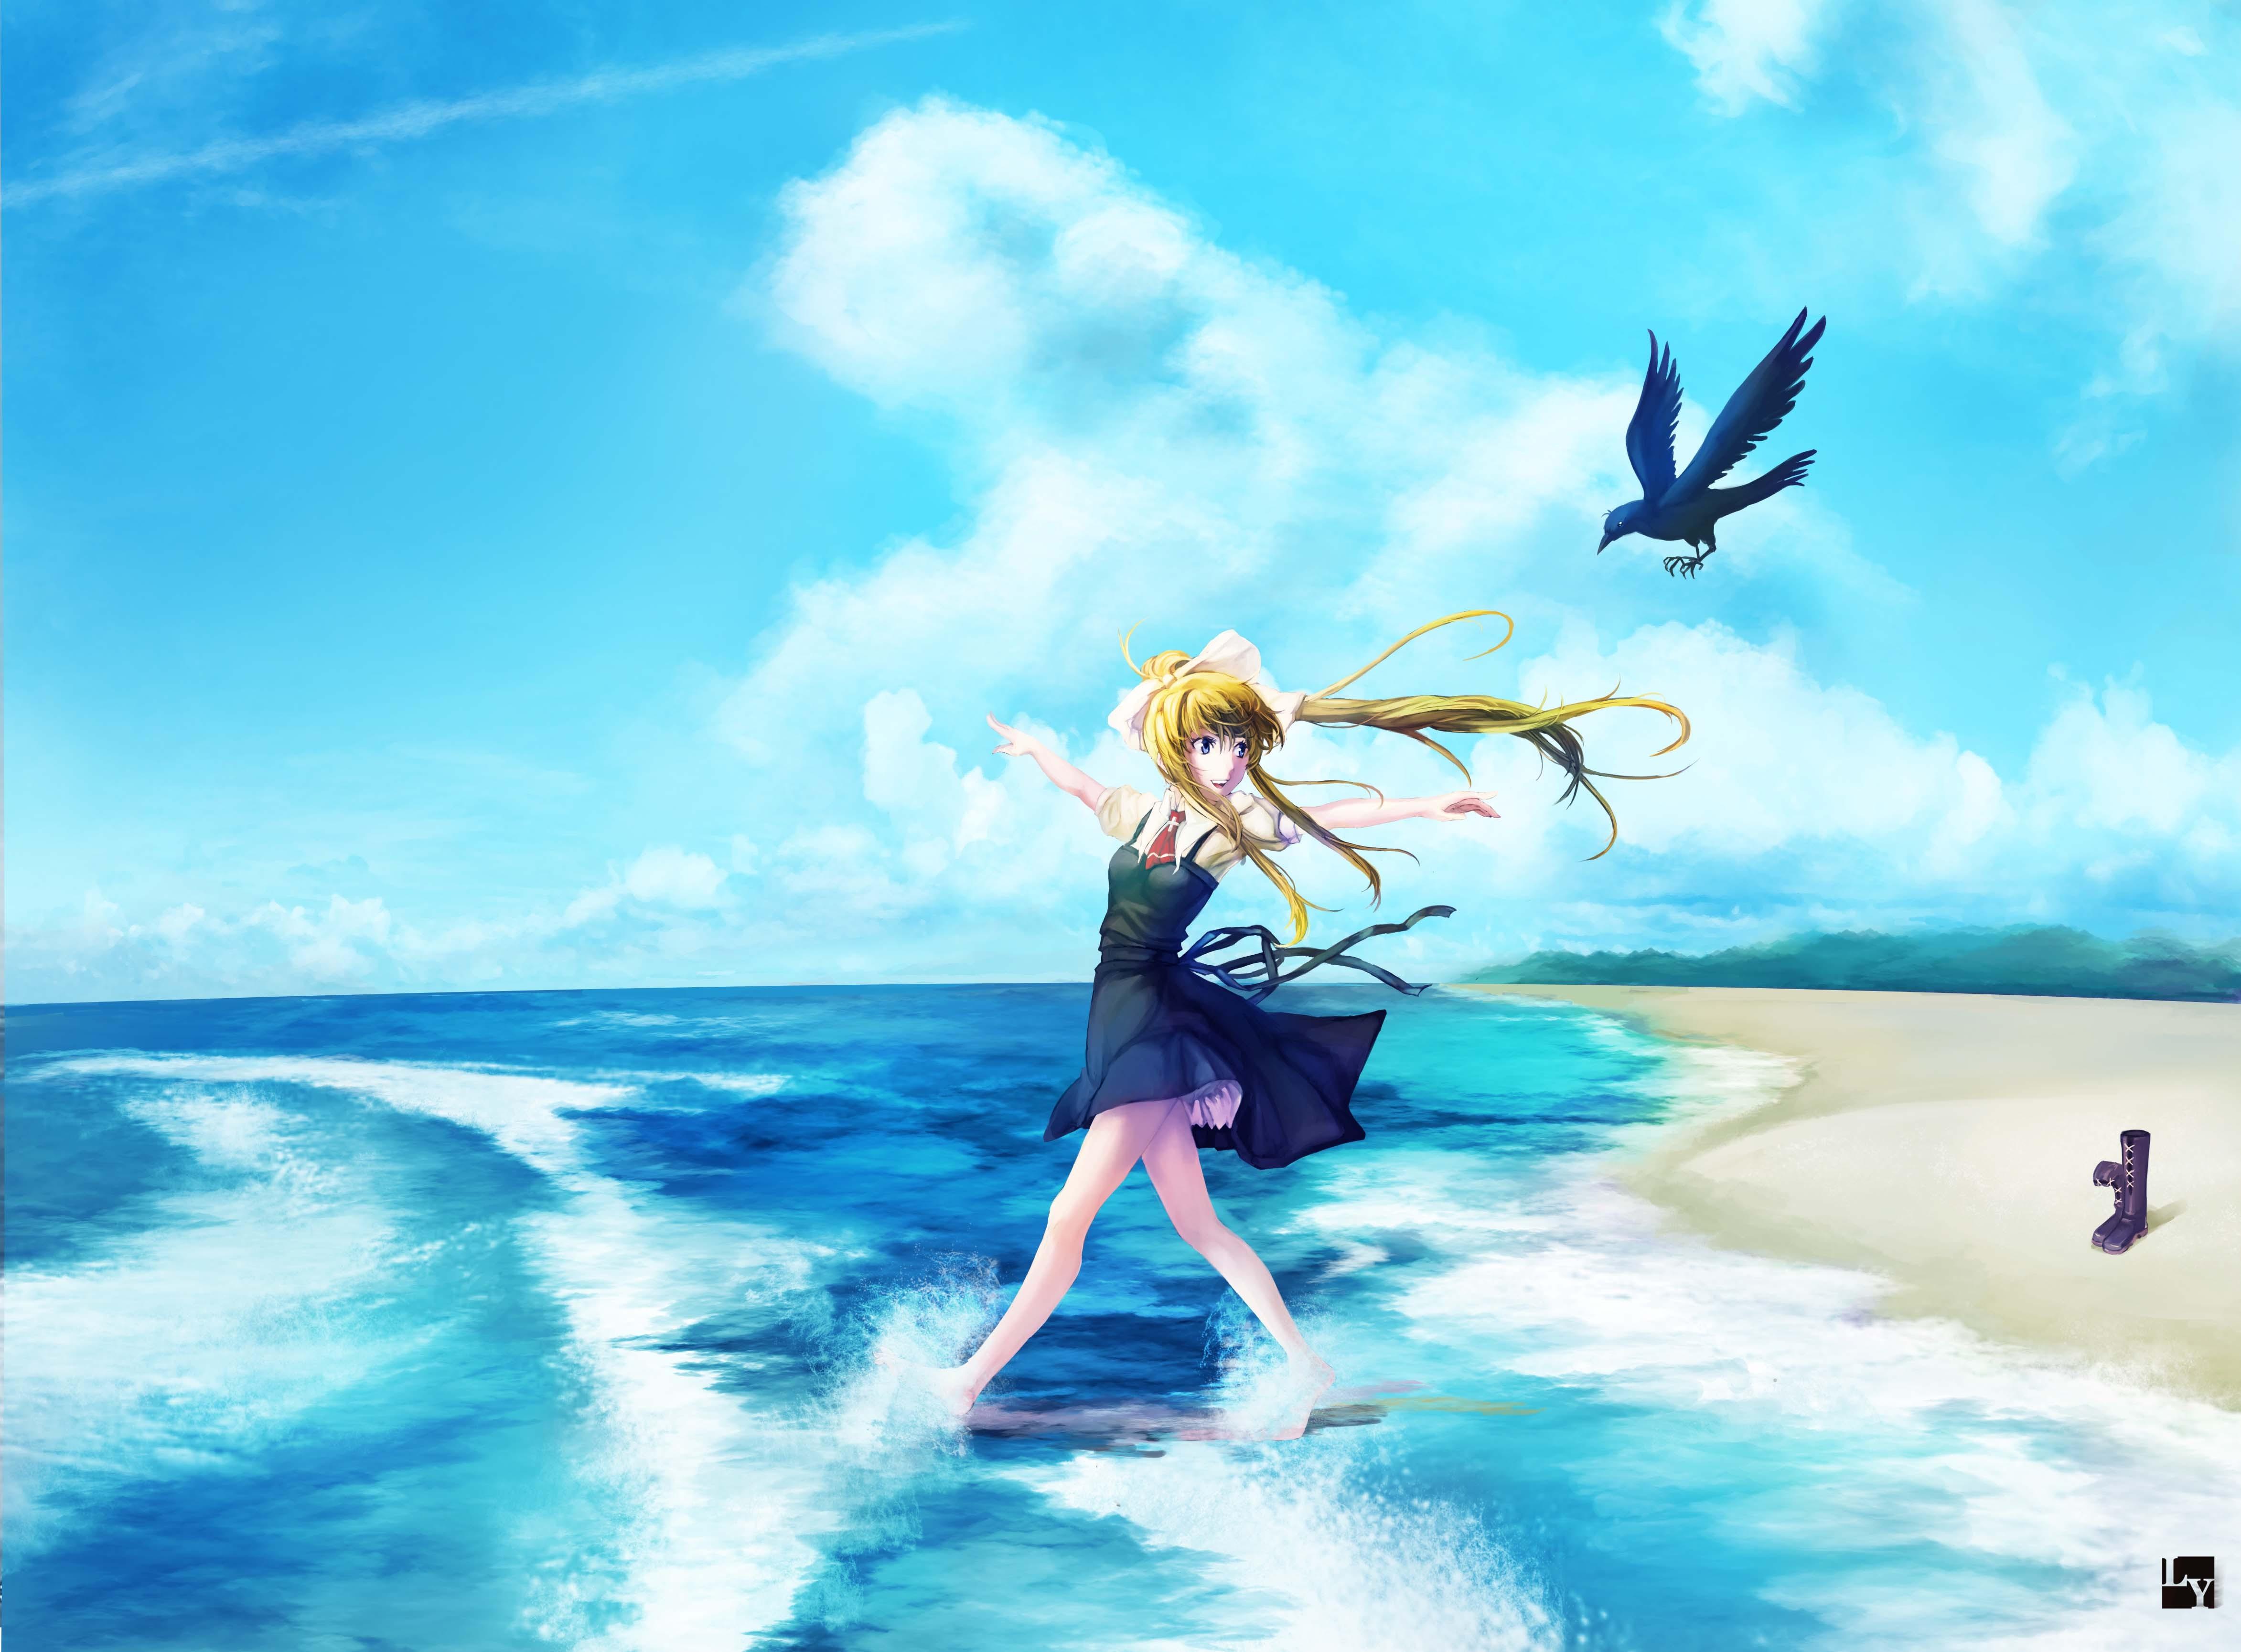 sea anime anime girls sky blue wind Air anime ocean wave surfboard computer wallpaper surfing equipment